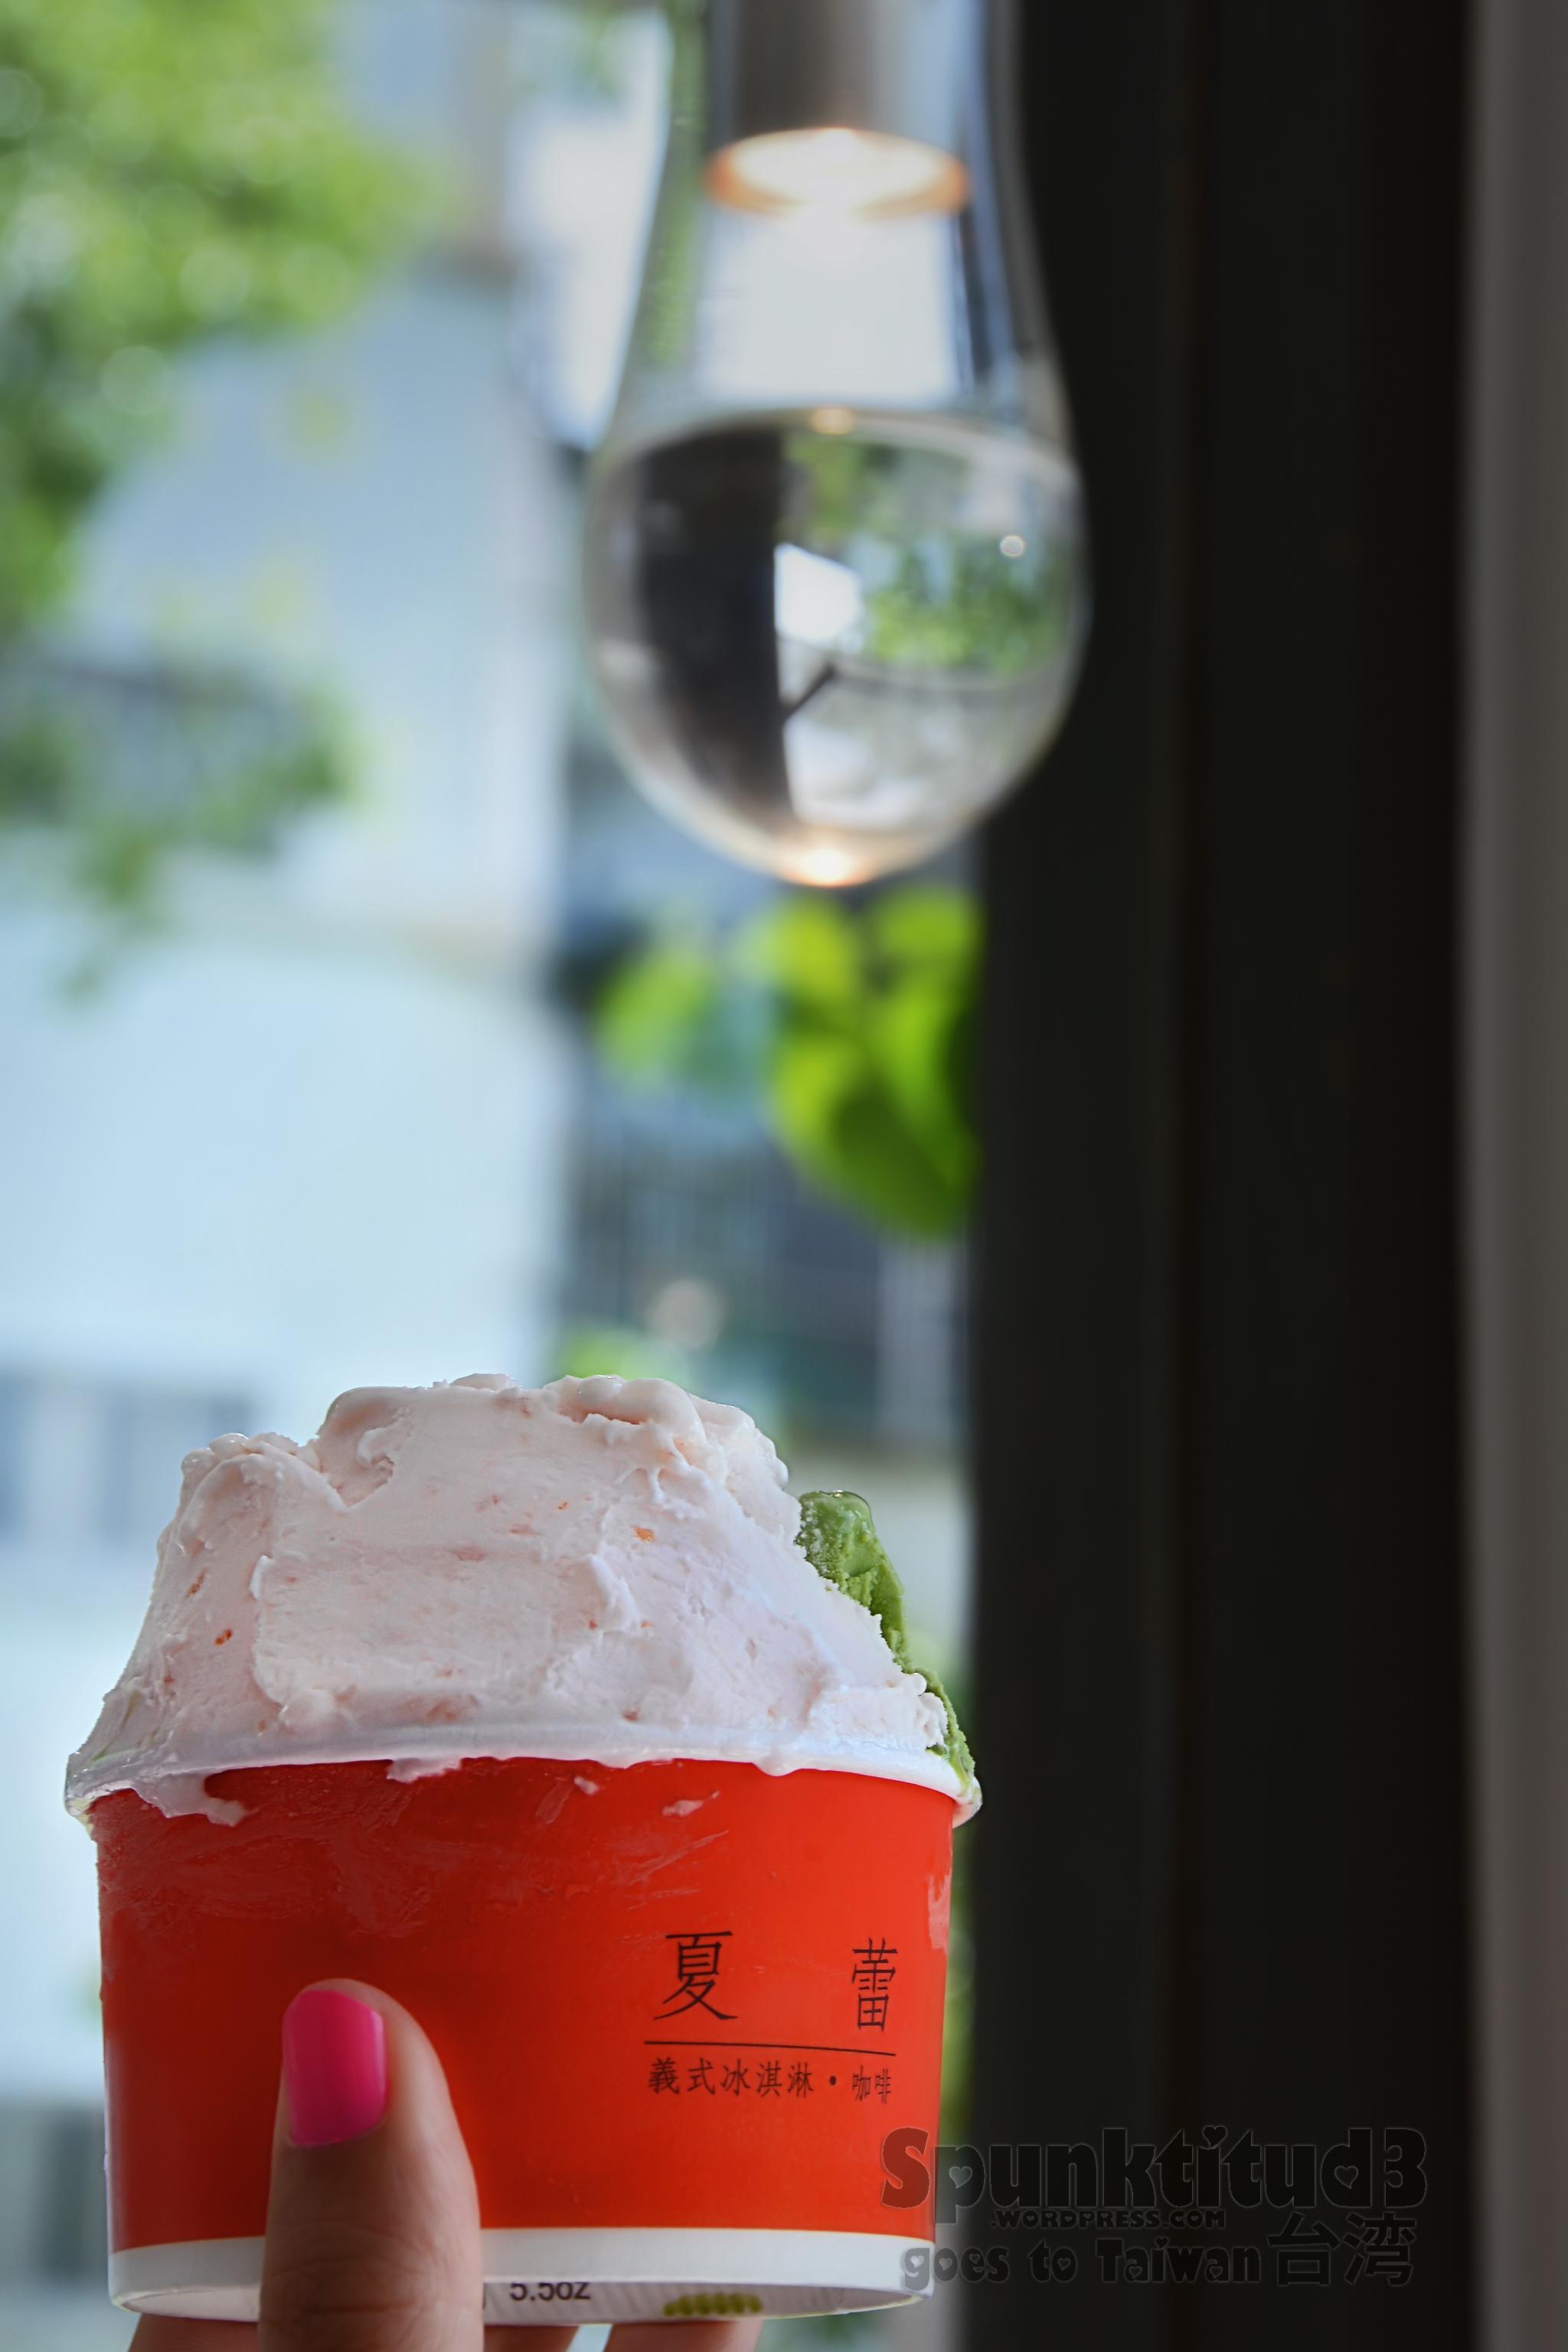 Chalet Gelato 夏蕾義式冰淇淋